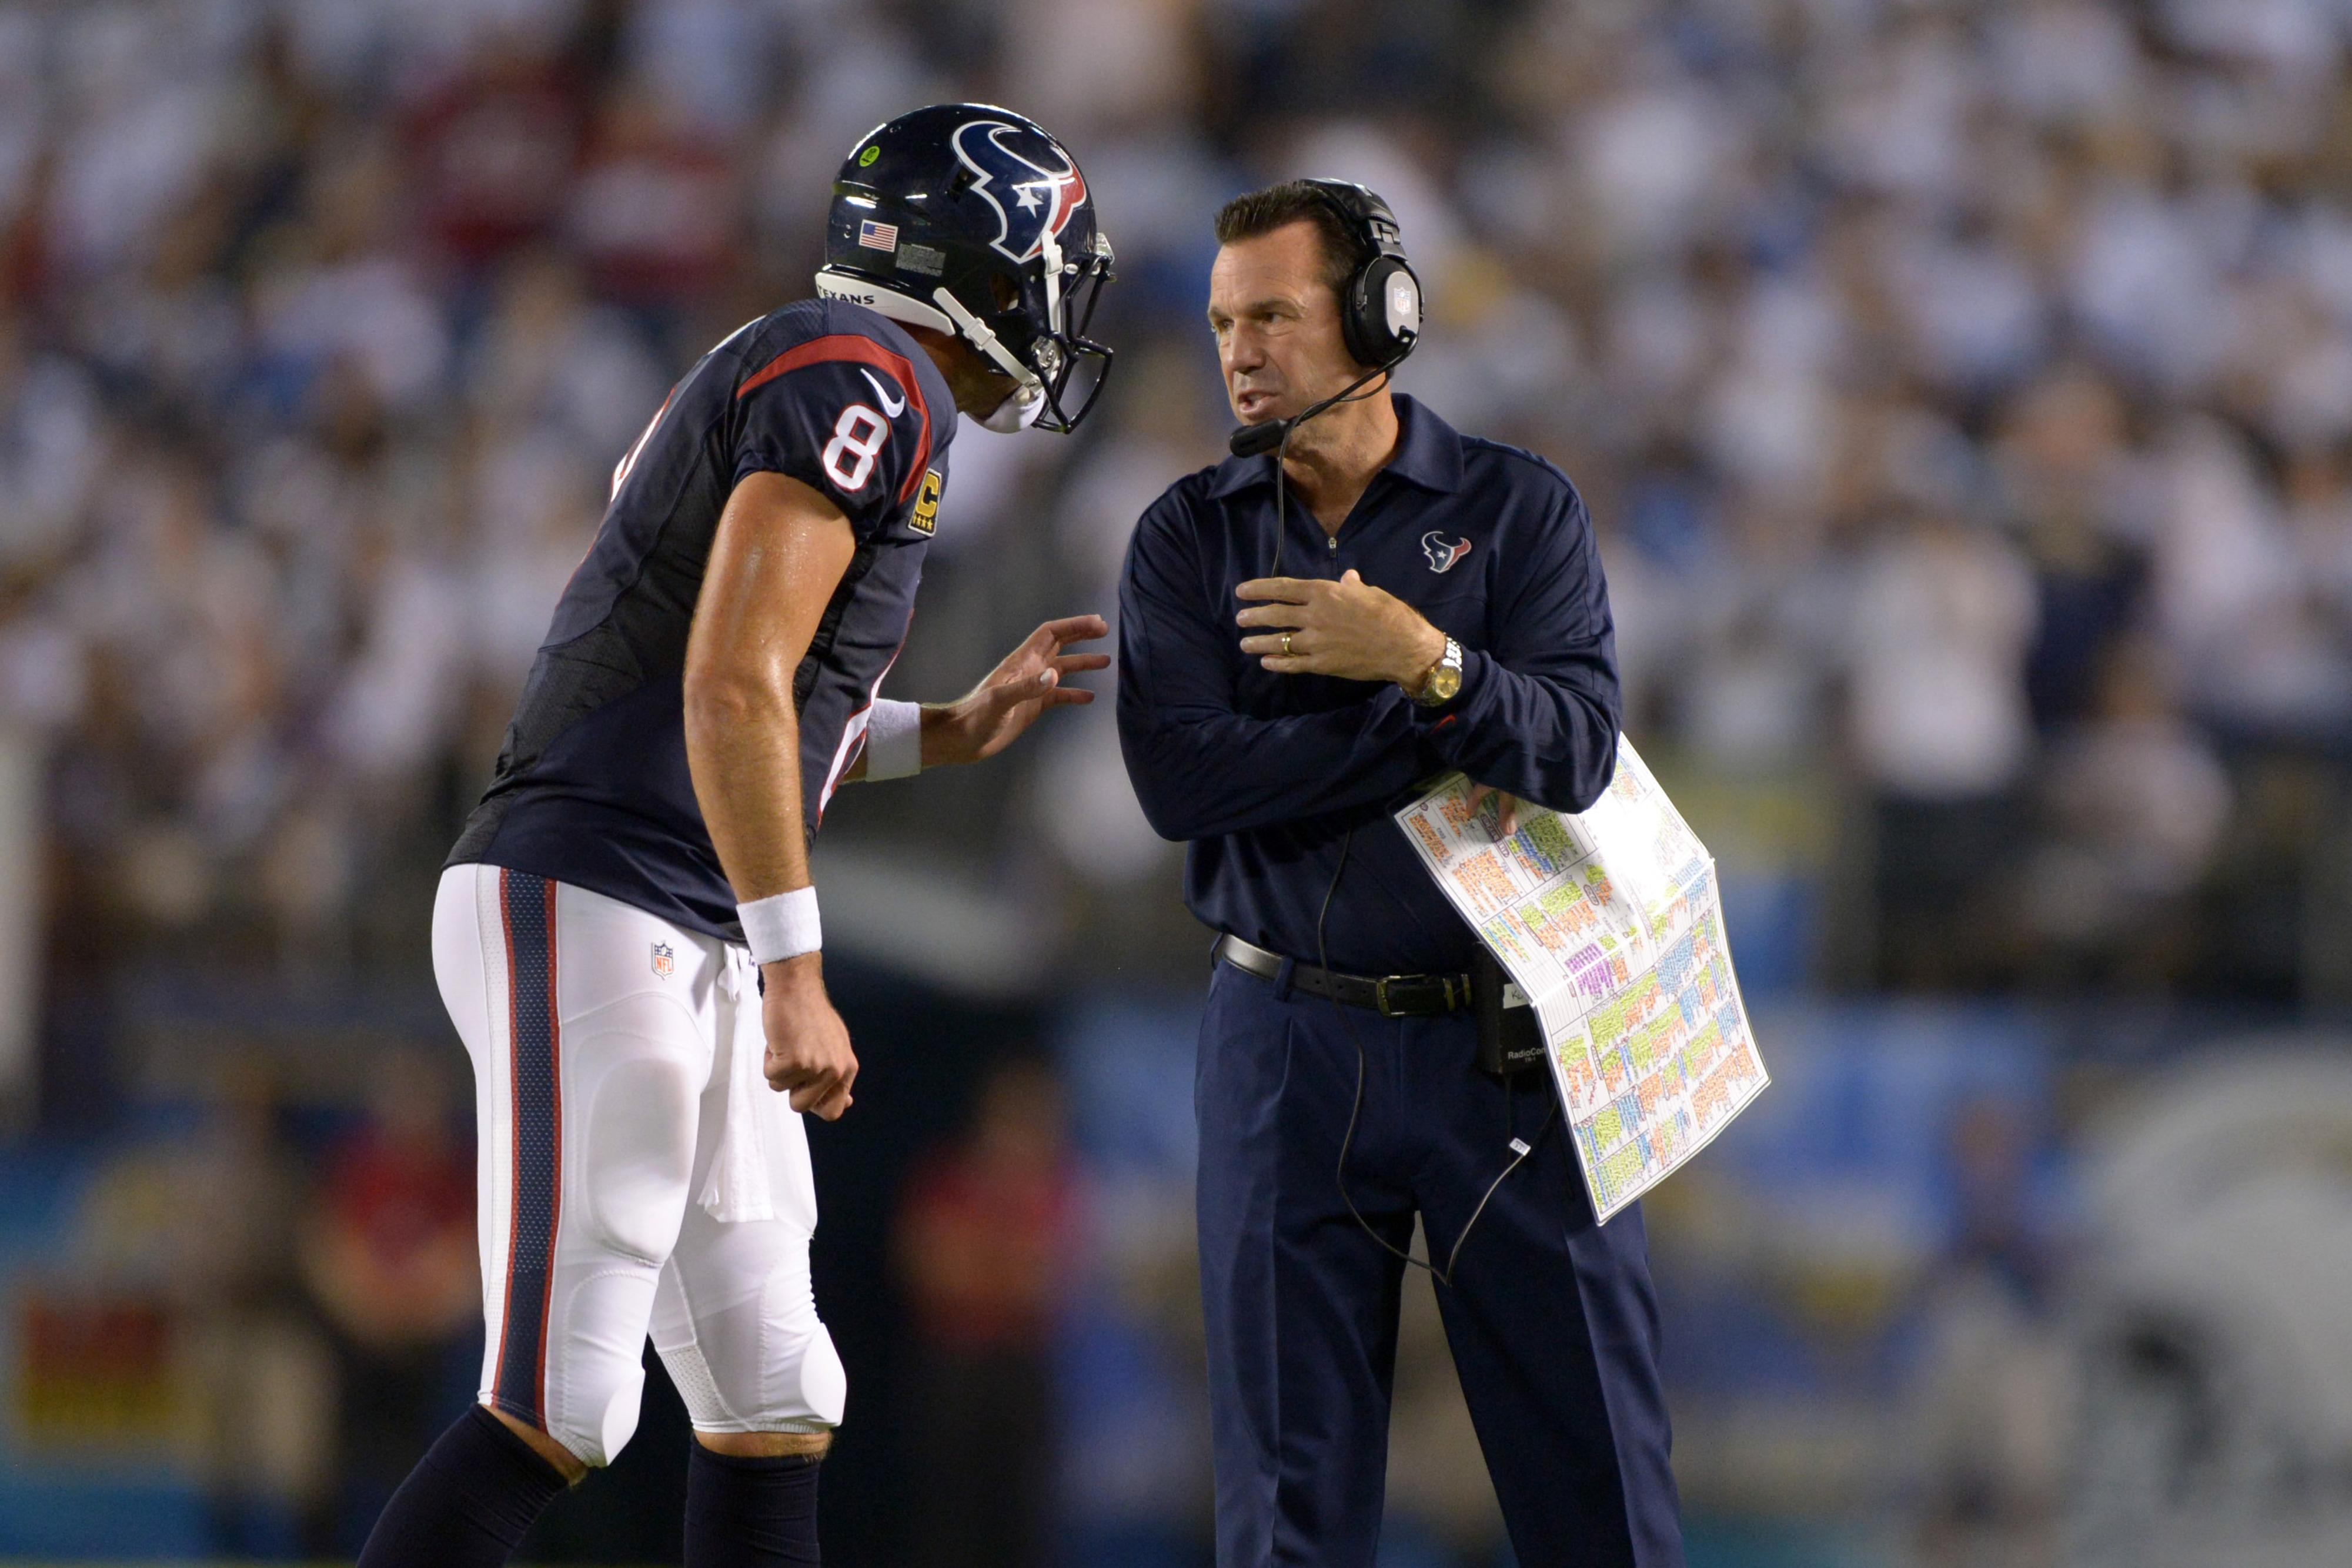 """I got this, Coach."""